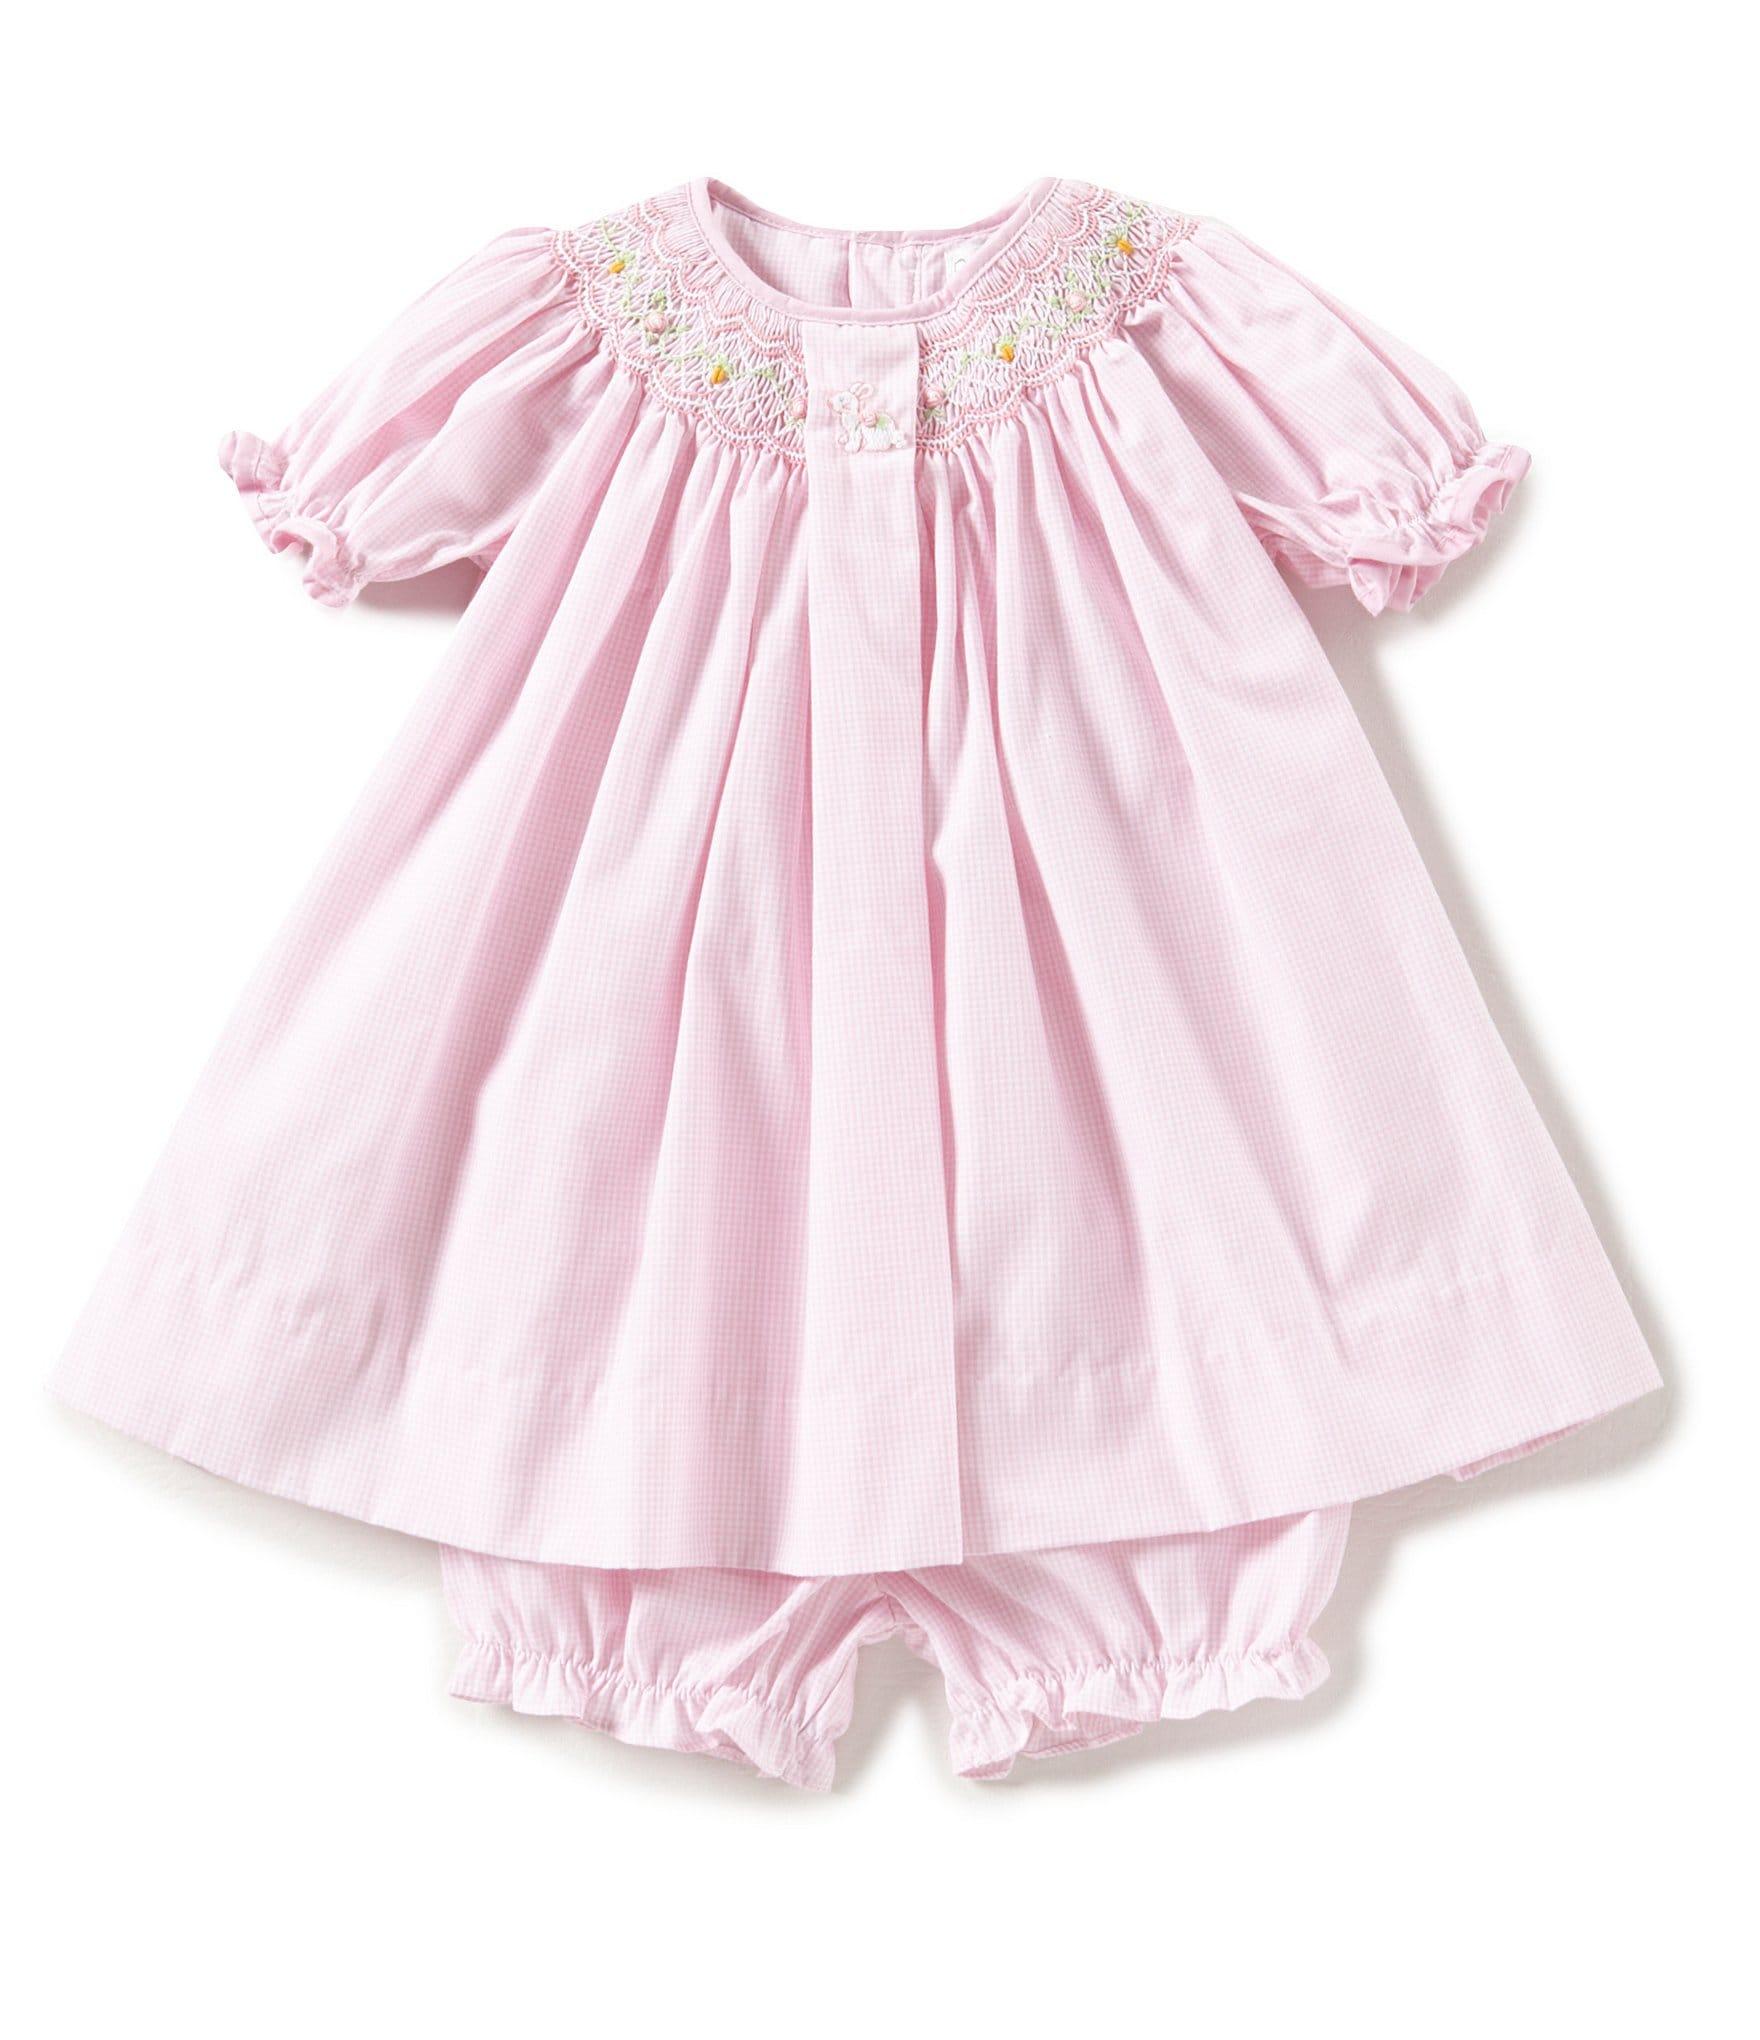 Petit Ami Kids Baby Baby Girls Apparel Dresses